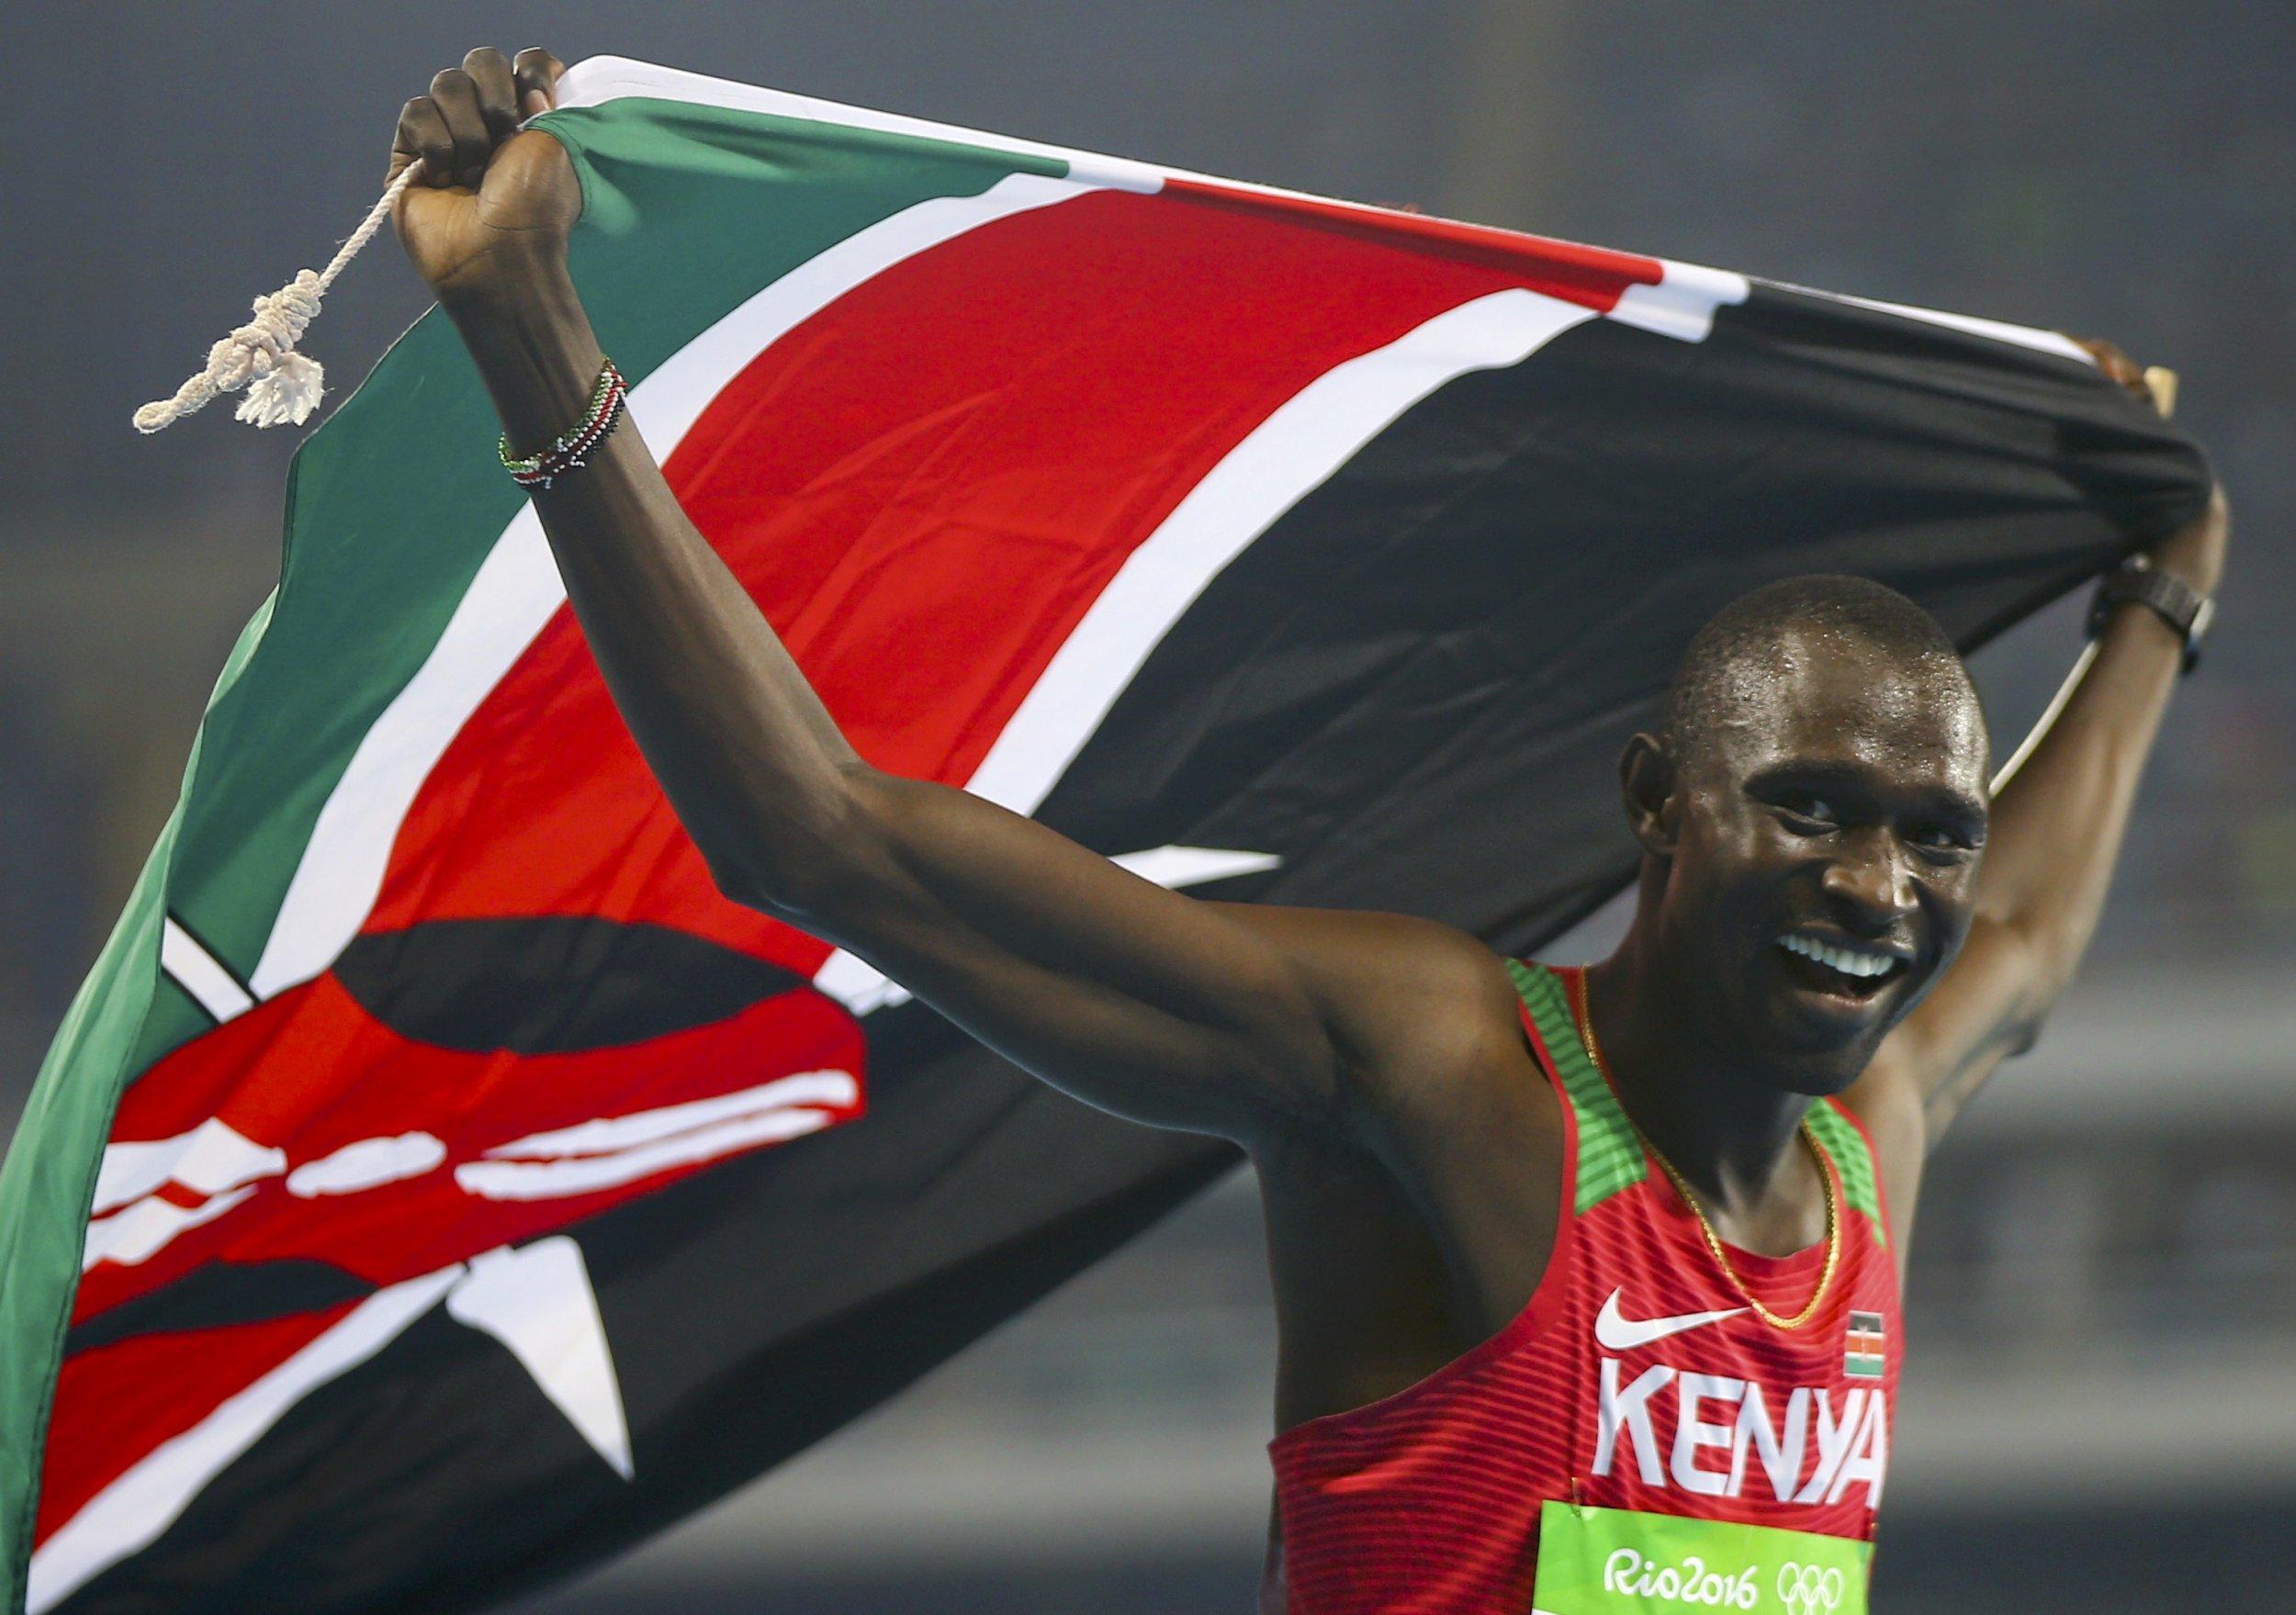 Kenya's David Rudisha